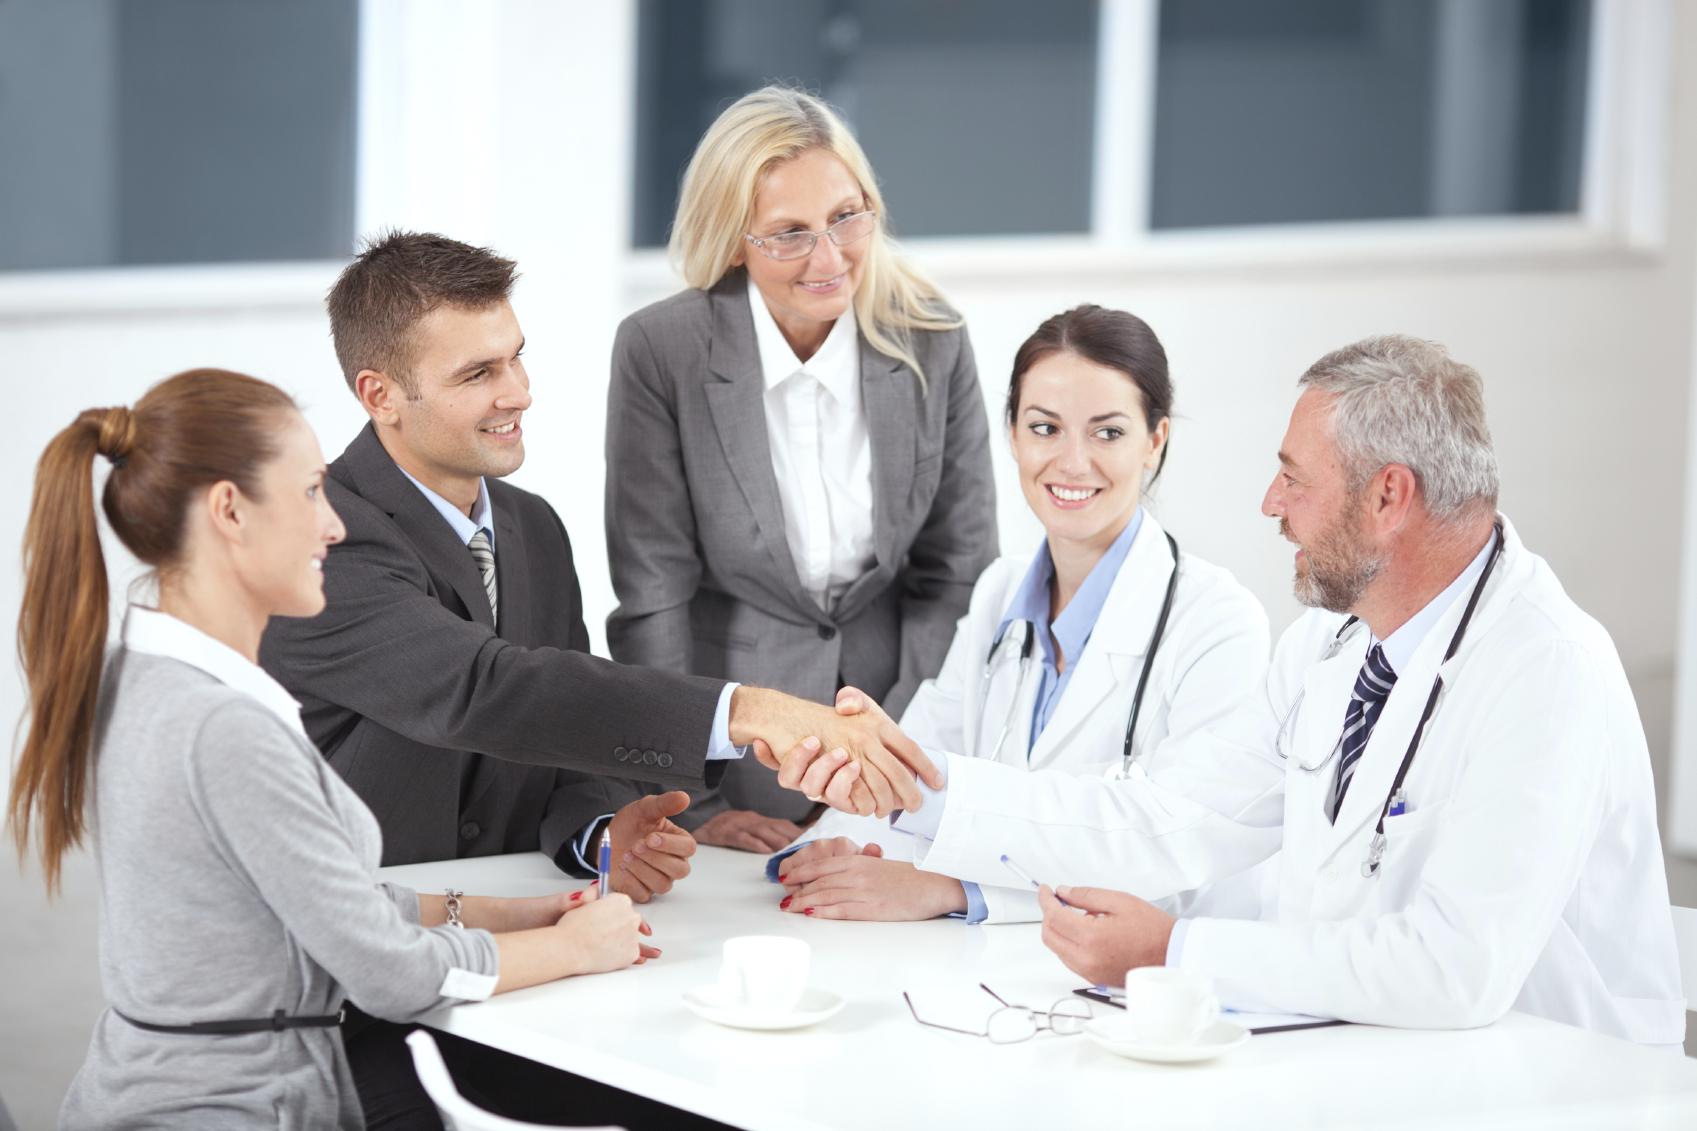 Картинки медицинские организации